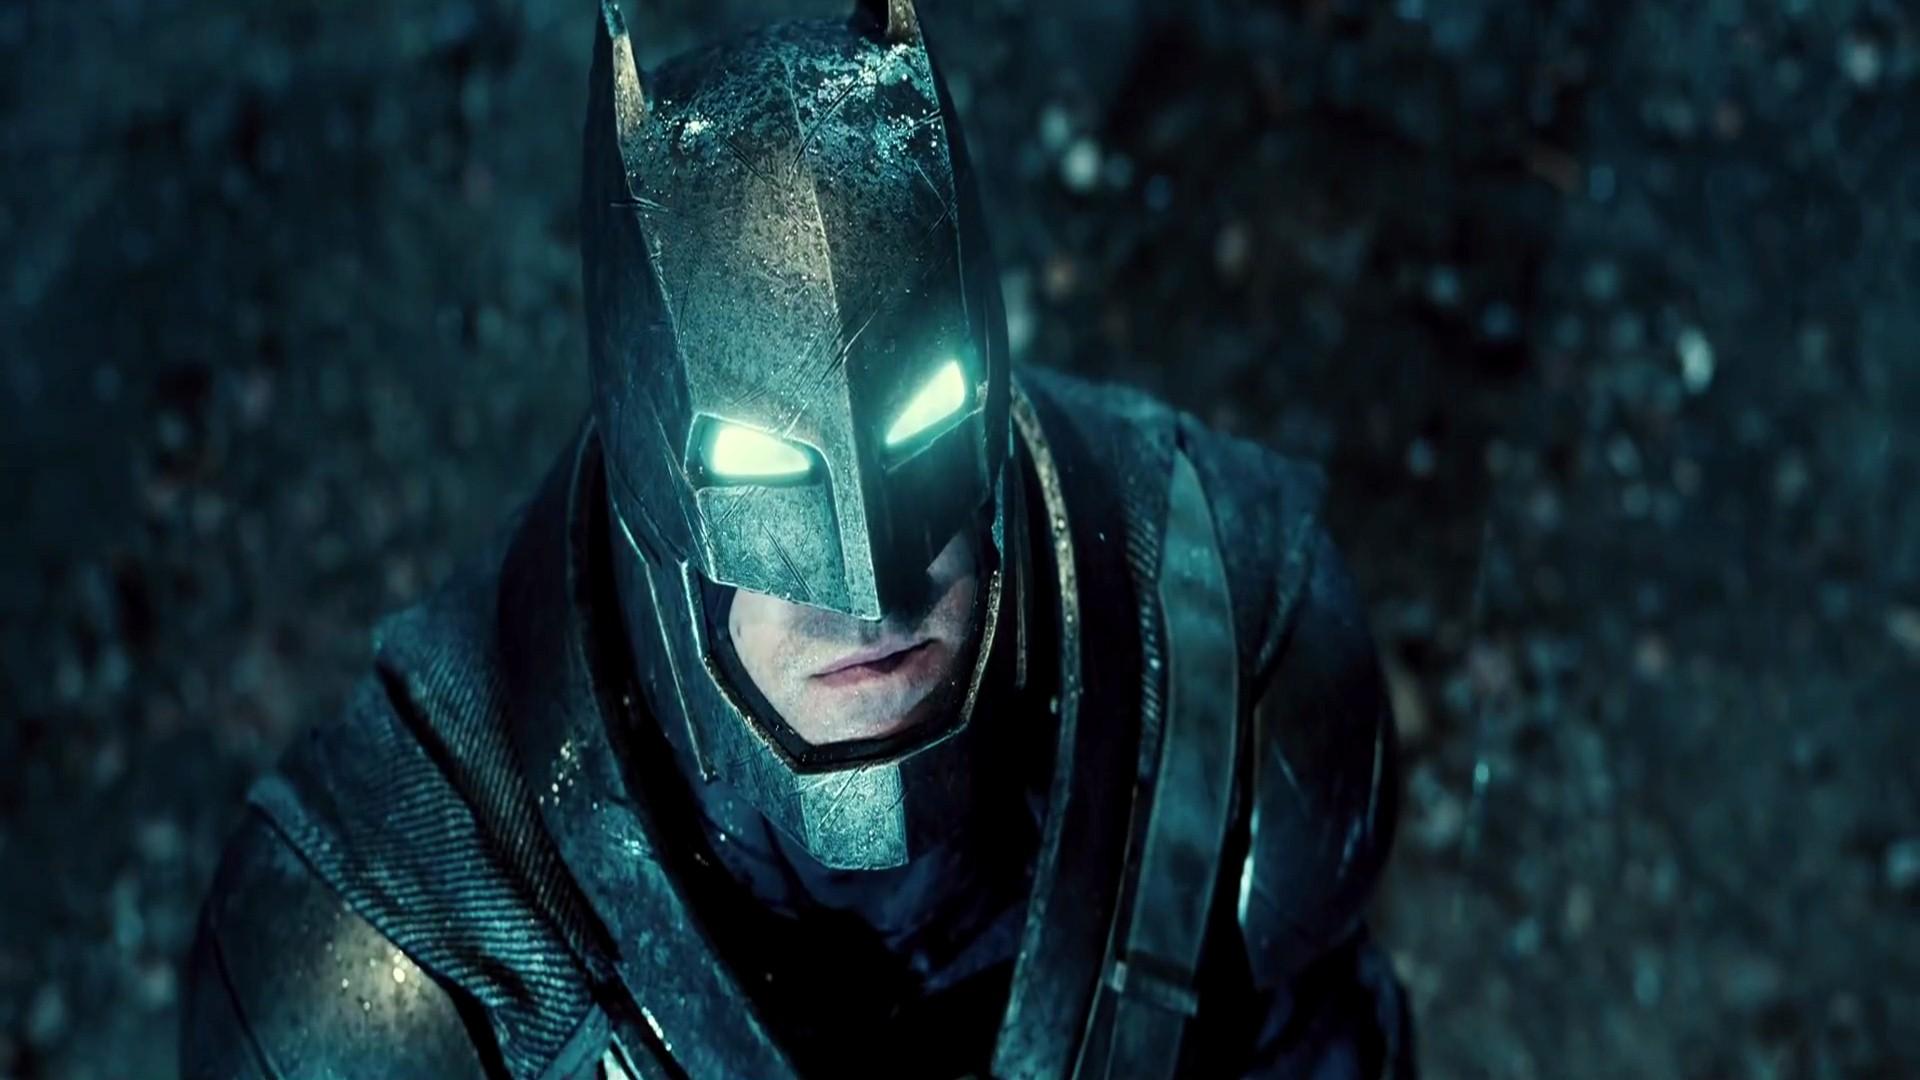 Free Download Batman V Superman Hollywood Movie Hd